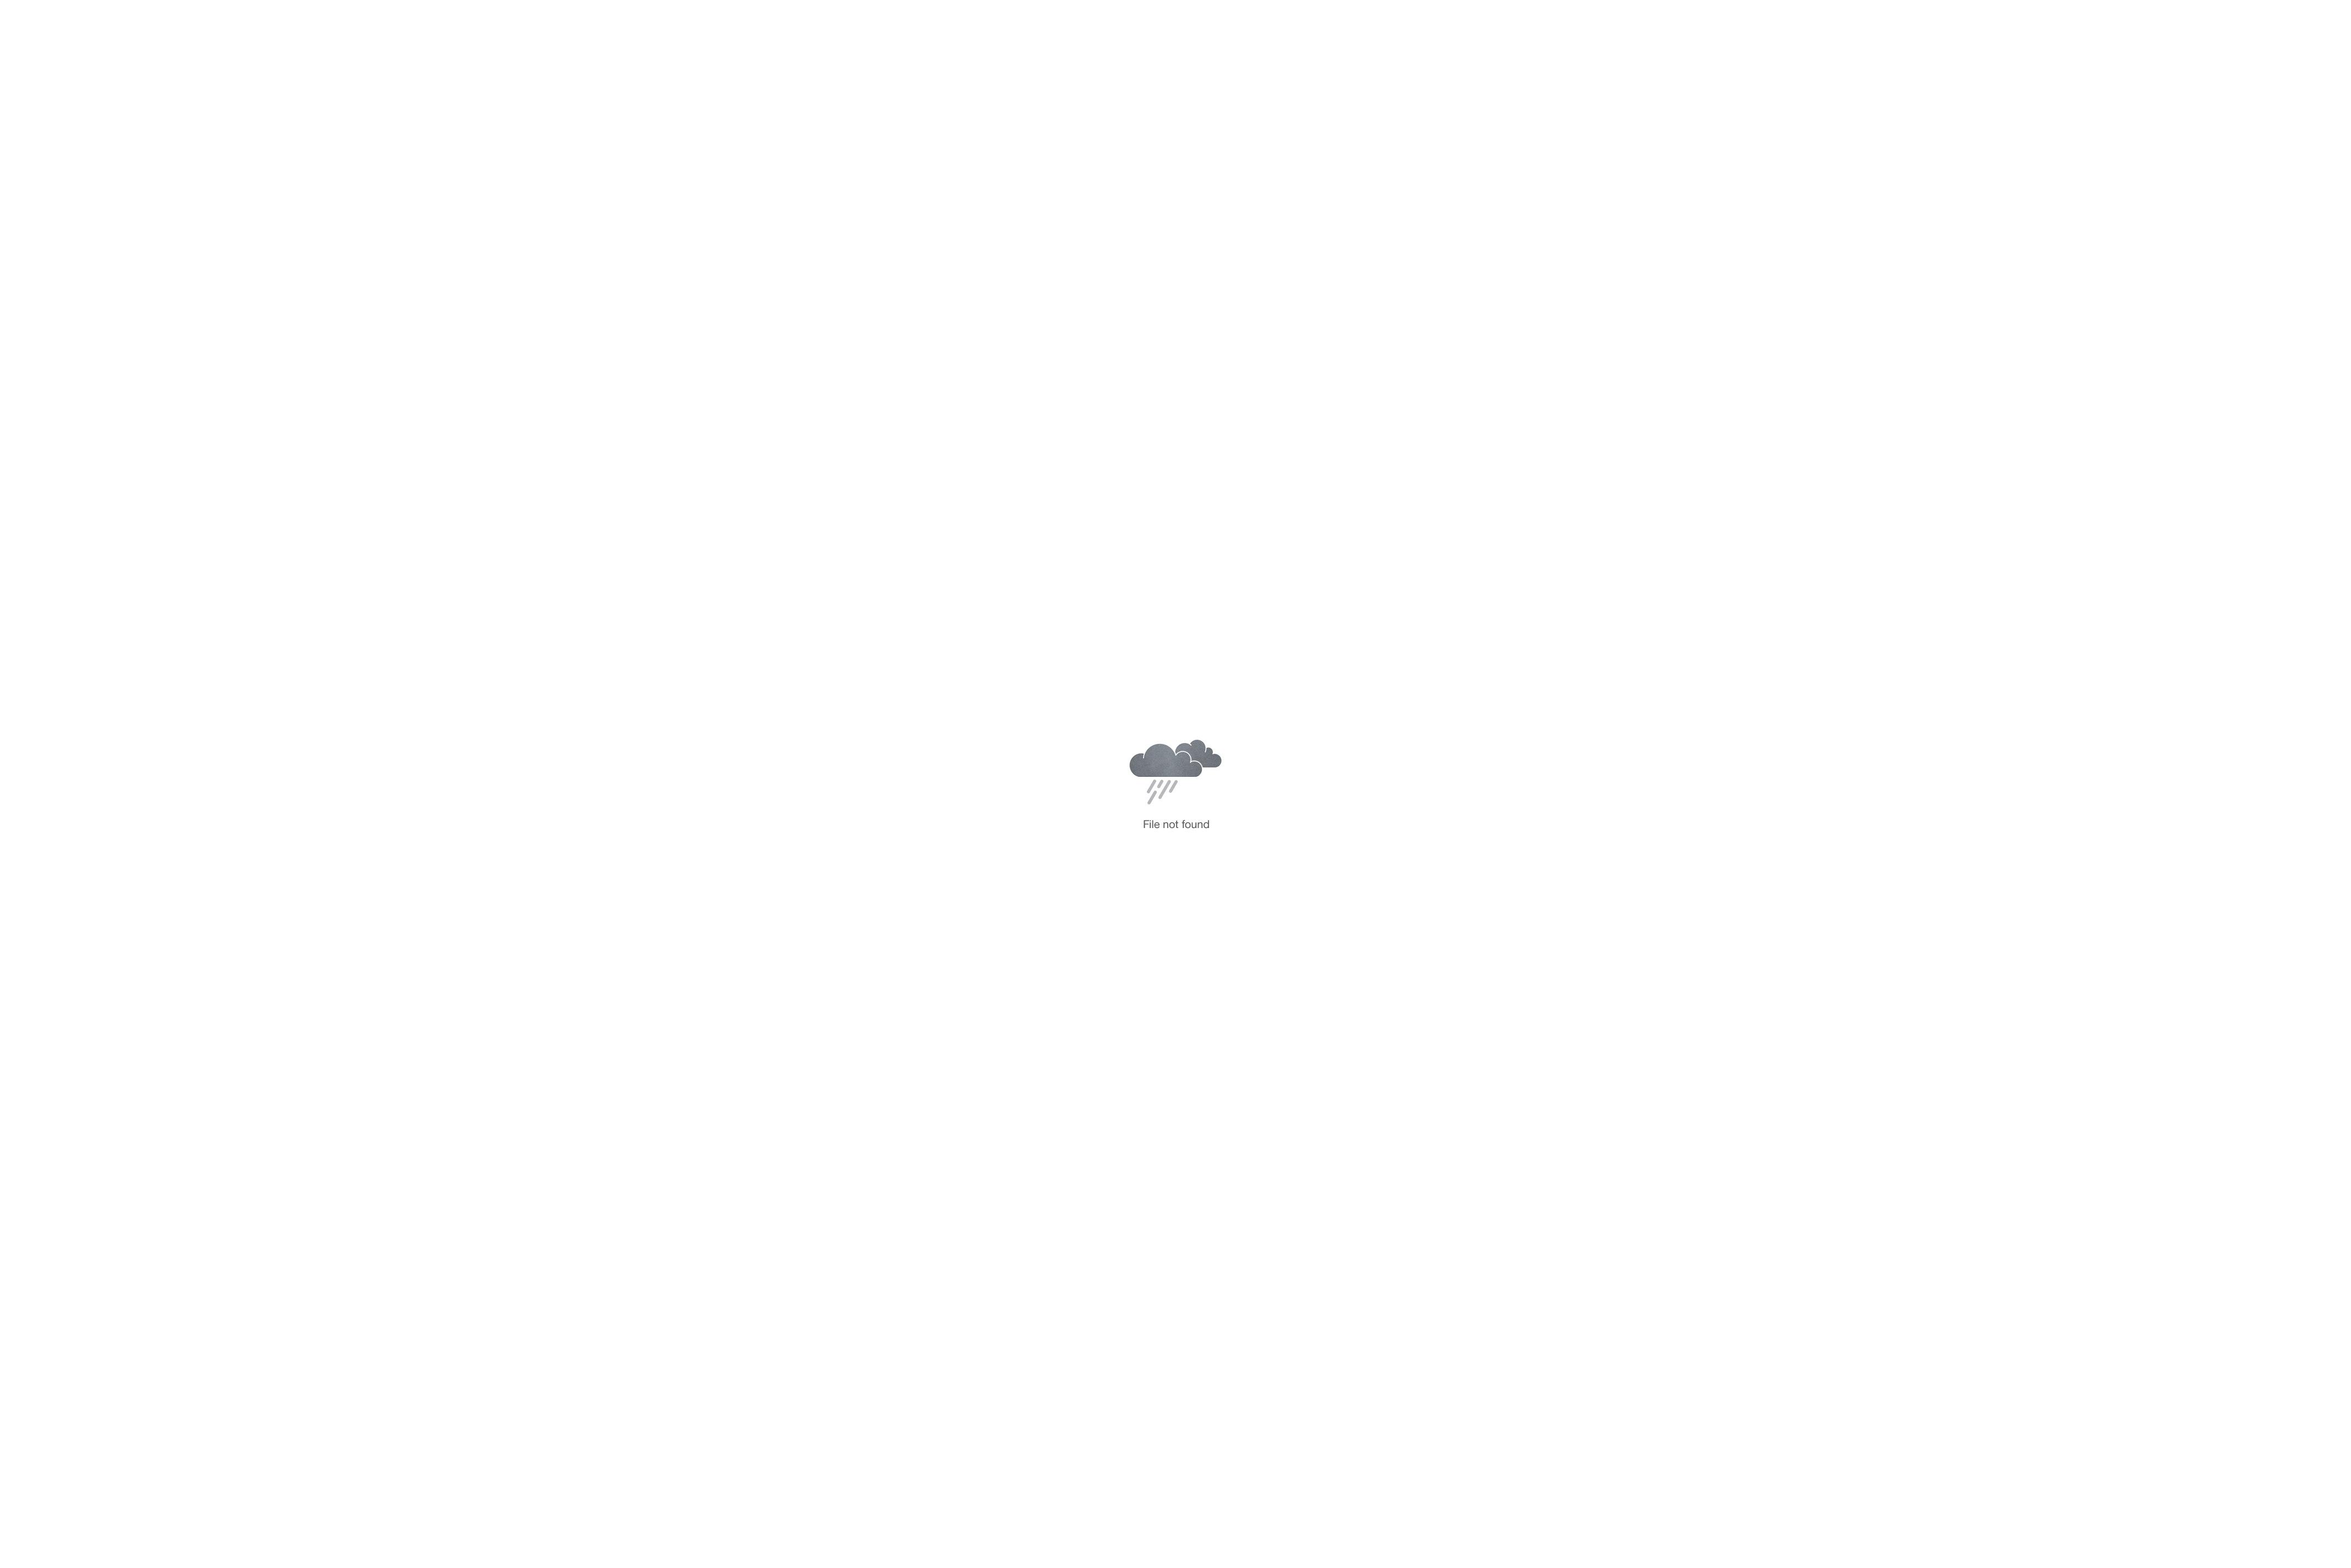 Gerald-DESCAMPS-Rugby-Sponsorise-me-image-3